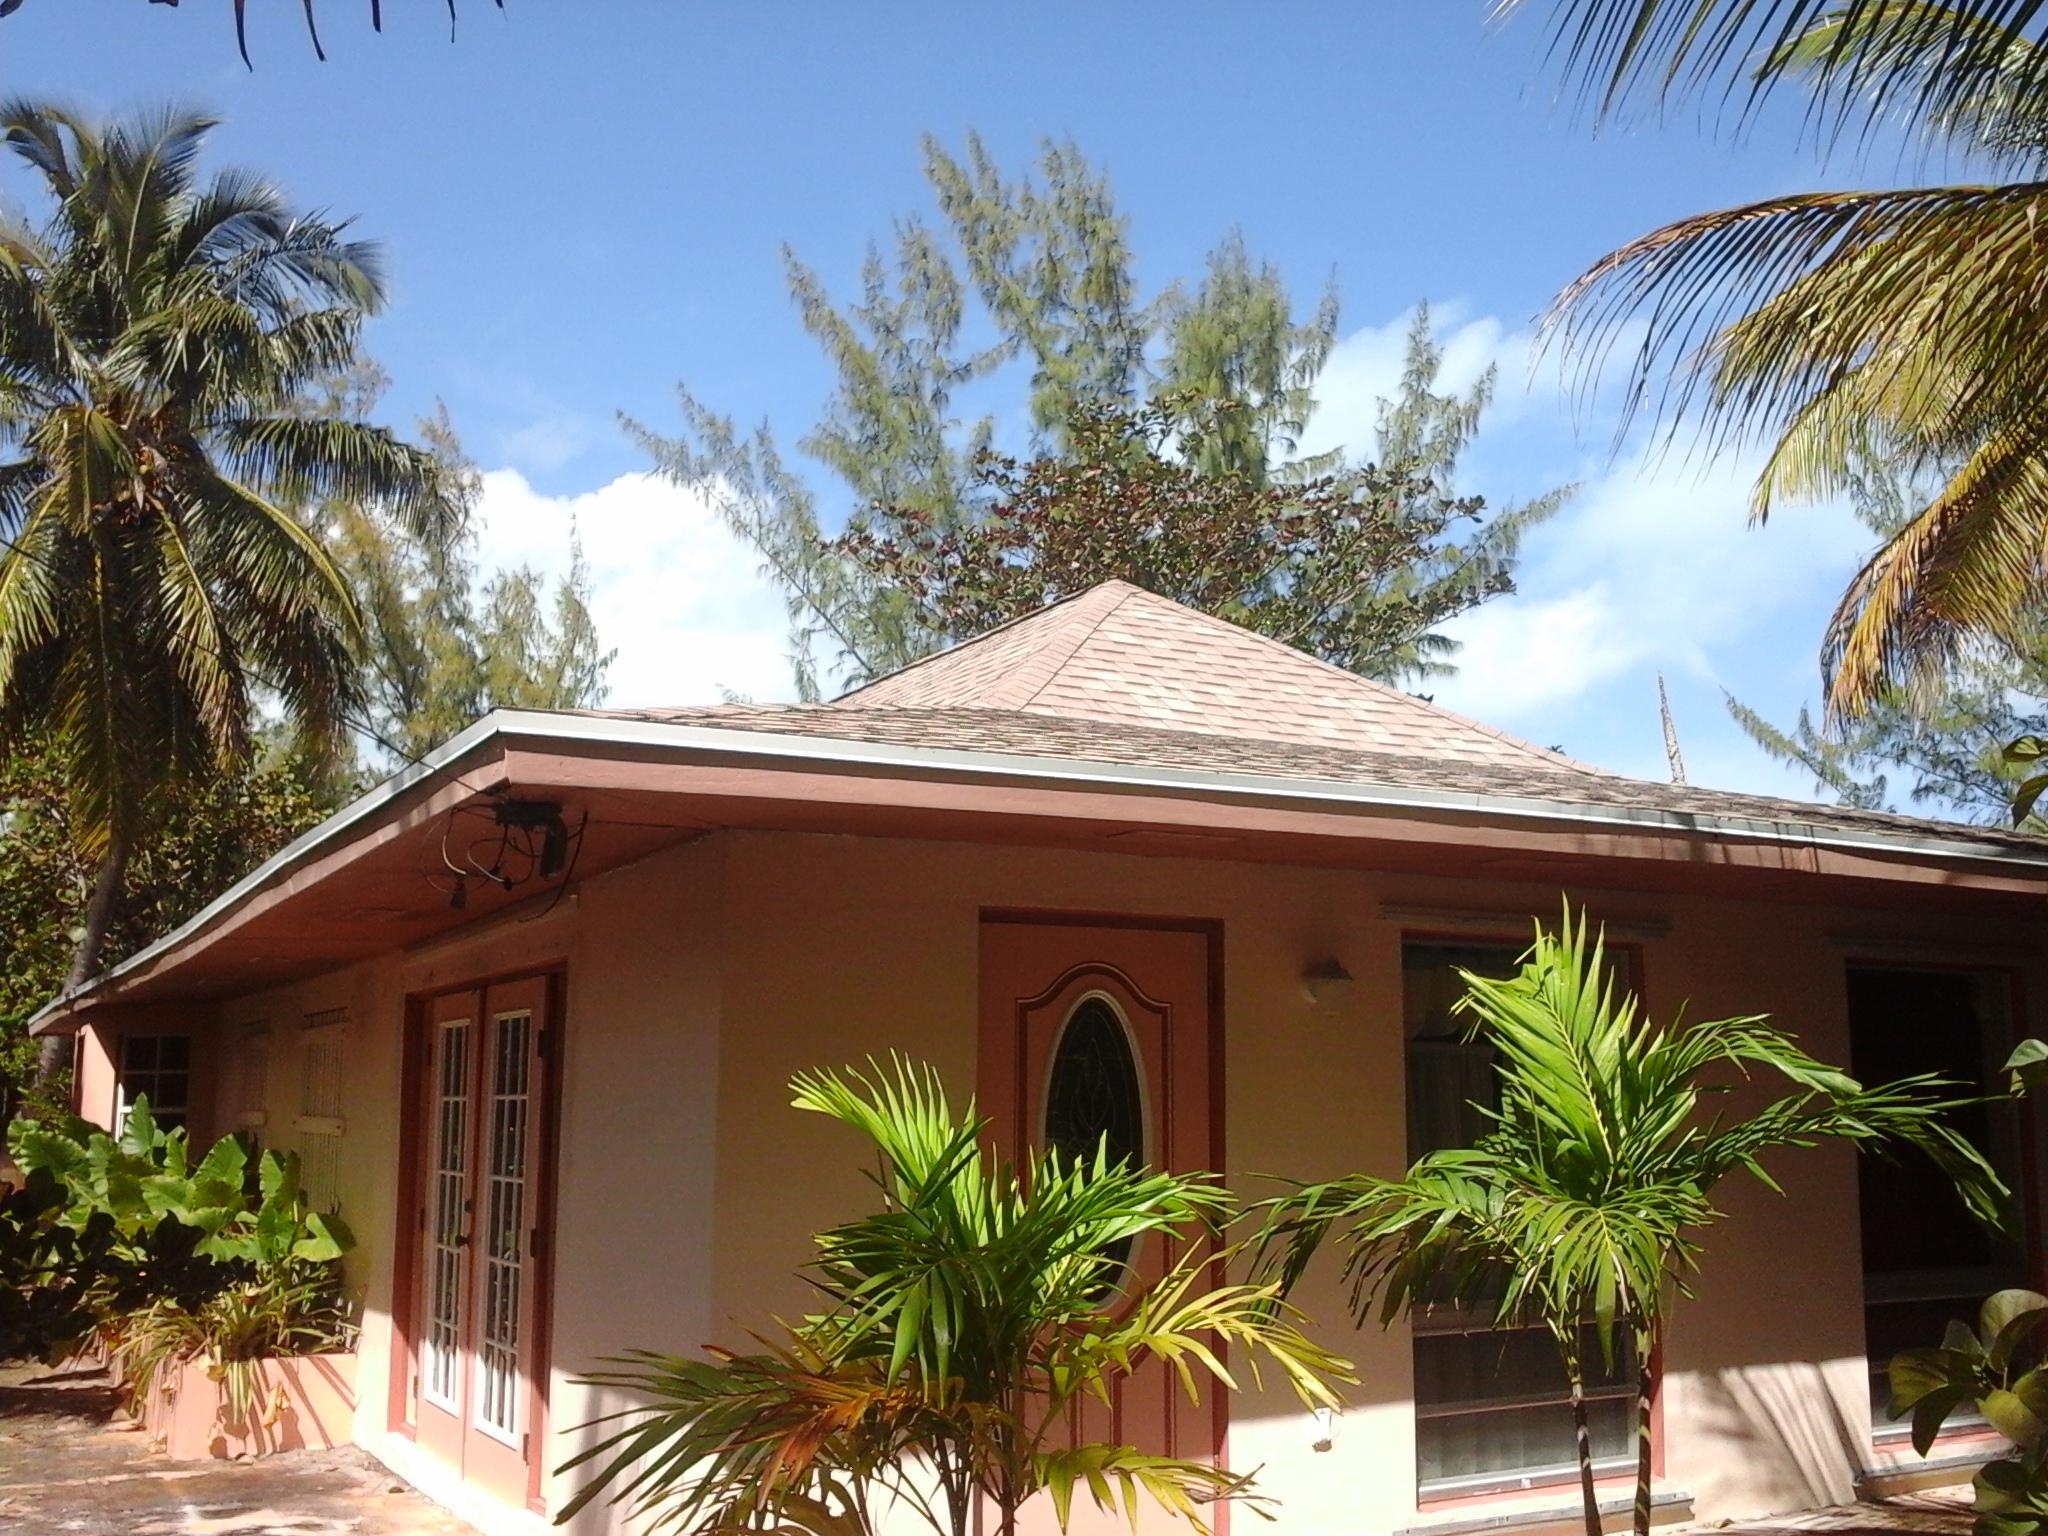 Additional photo for property listing at Brigantine Bungalow Treasure Cay, Abaco Bahamas